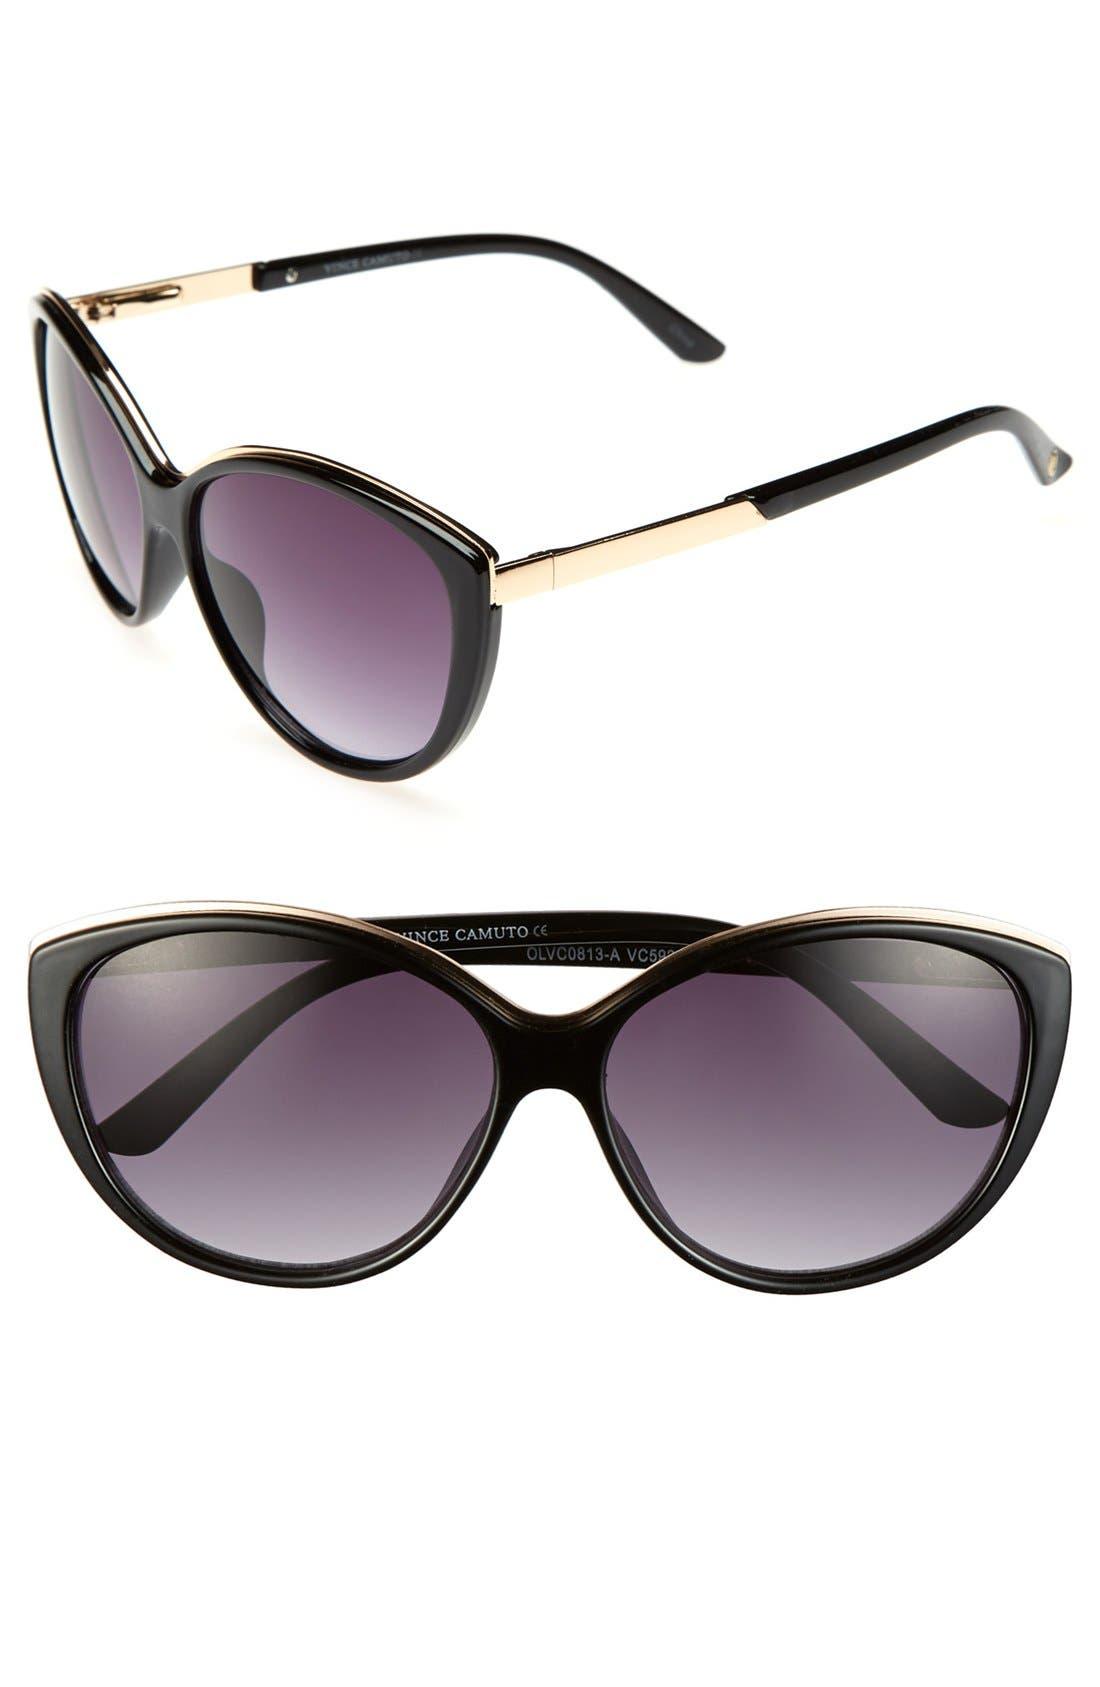 Main Image - Vince Camuto 58mm Cat Eye Sunglasses